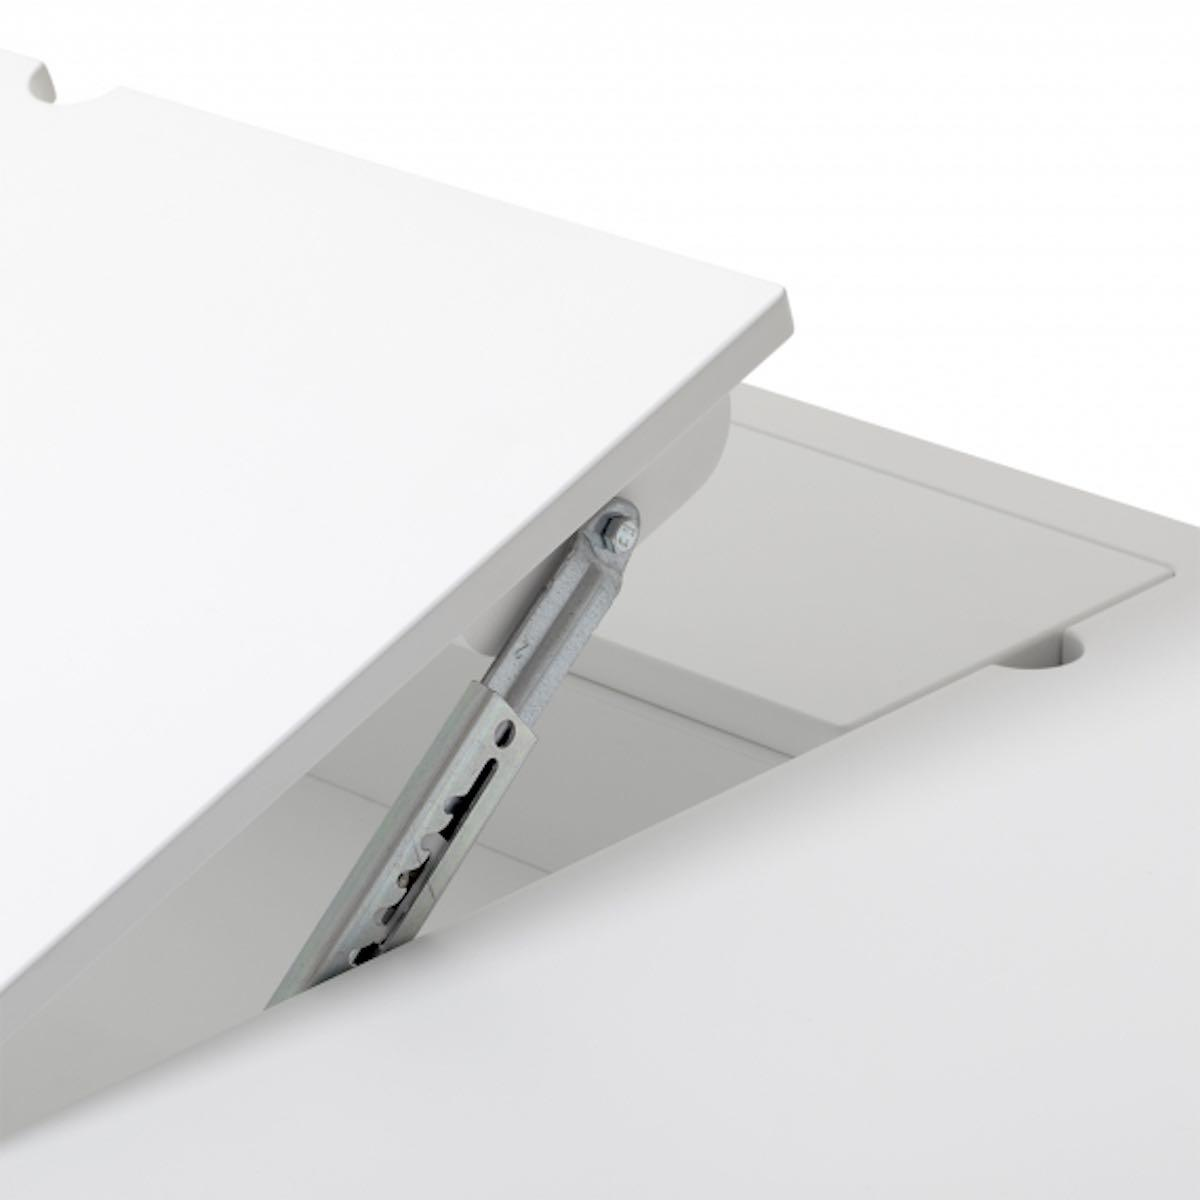 Bureau 72,6cm WOOD Oliver Furniture blanc-chêne